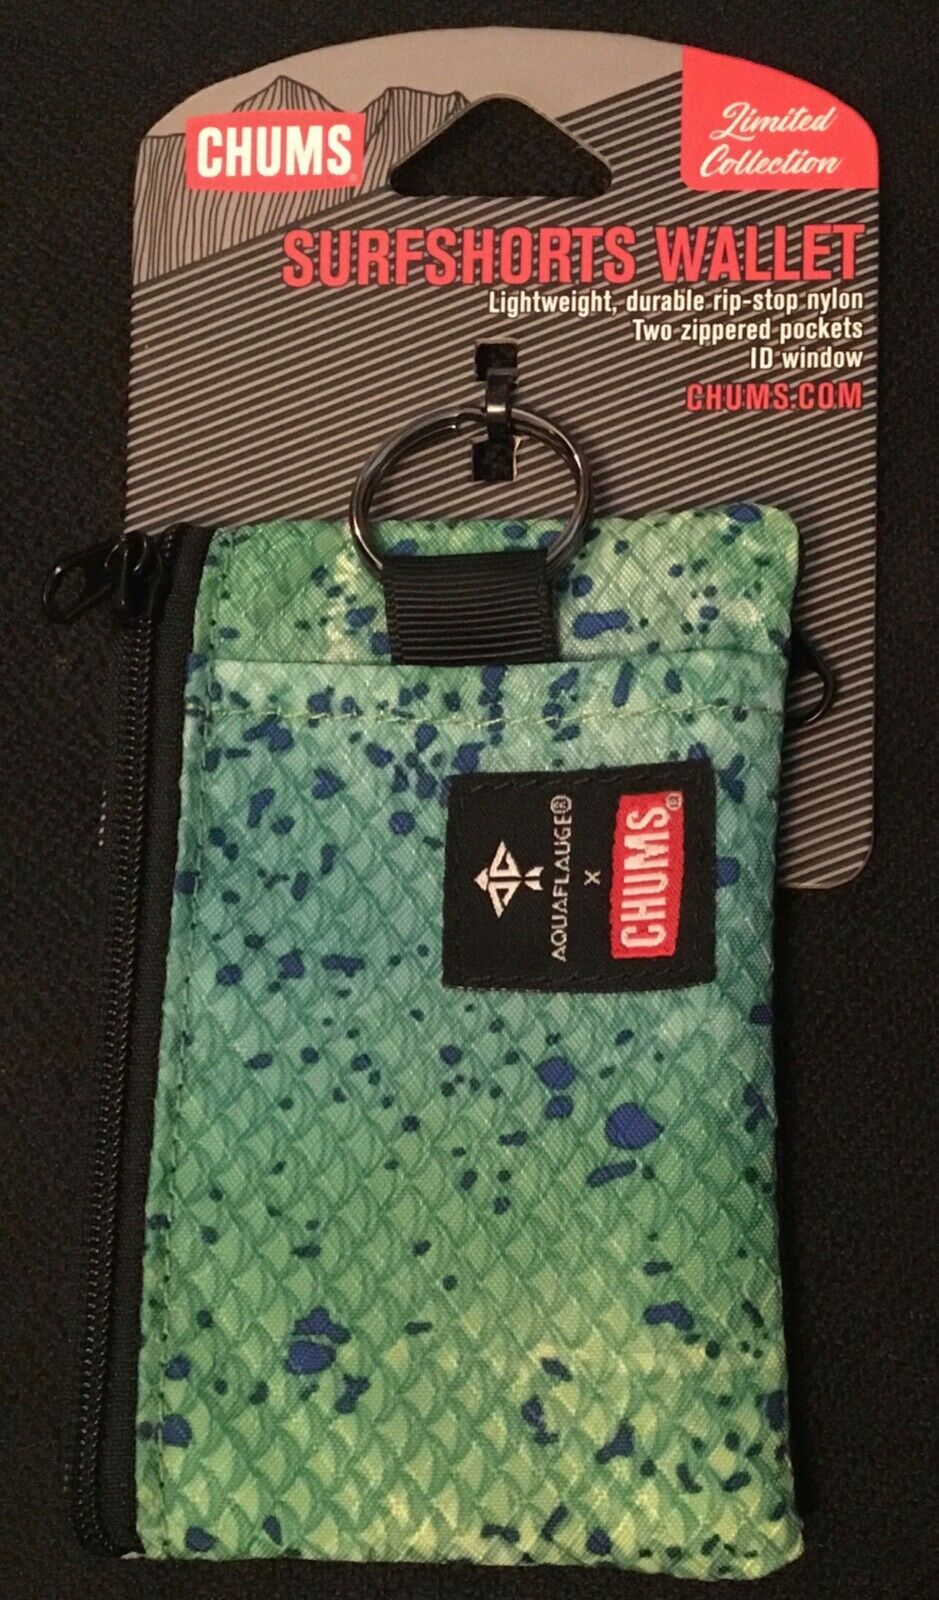 Chums Surfshort Wallet ID Holder Limited Collection Aqua Flauge Green Dorado